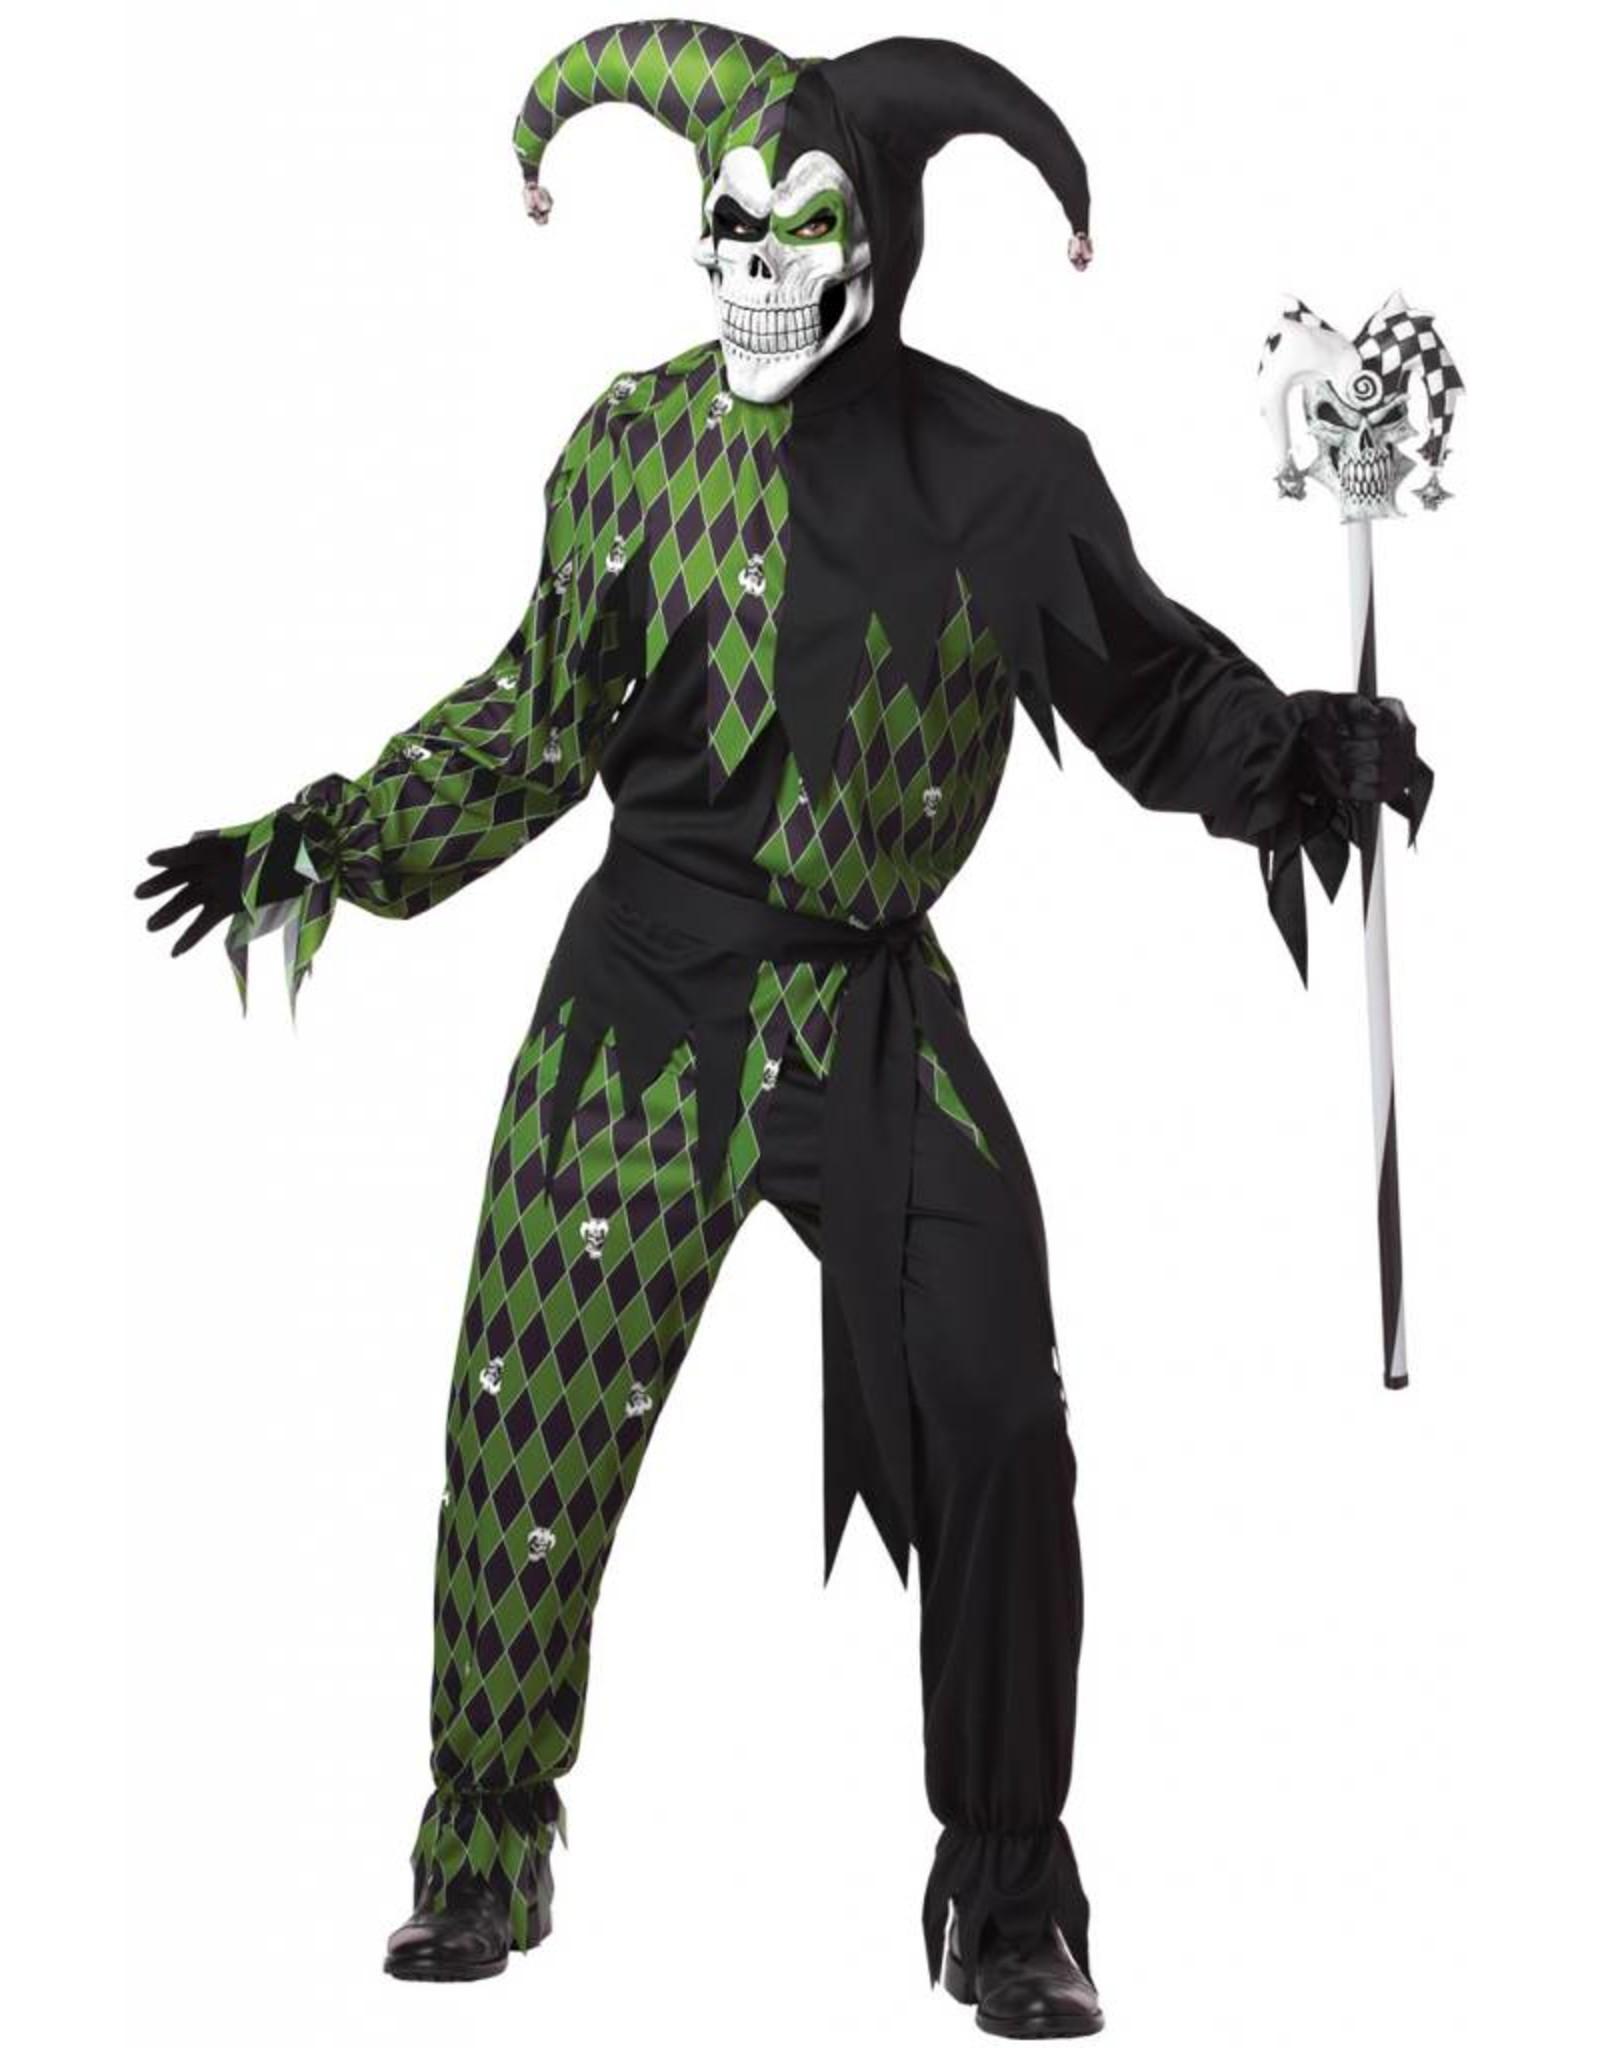 California Costume Jokes on You!